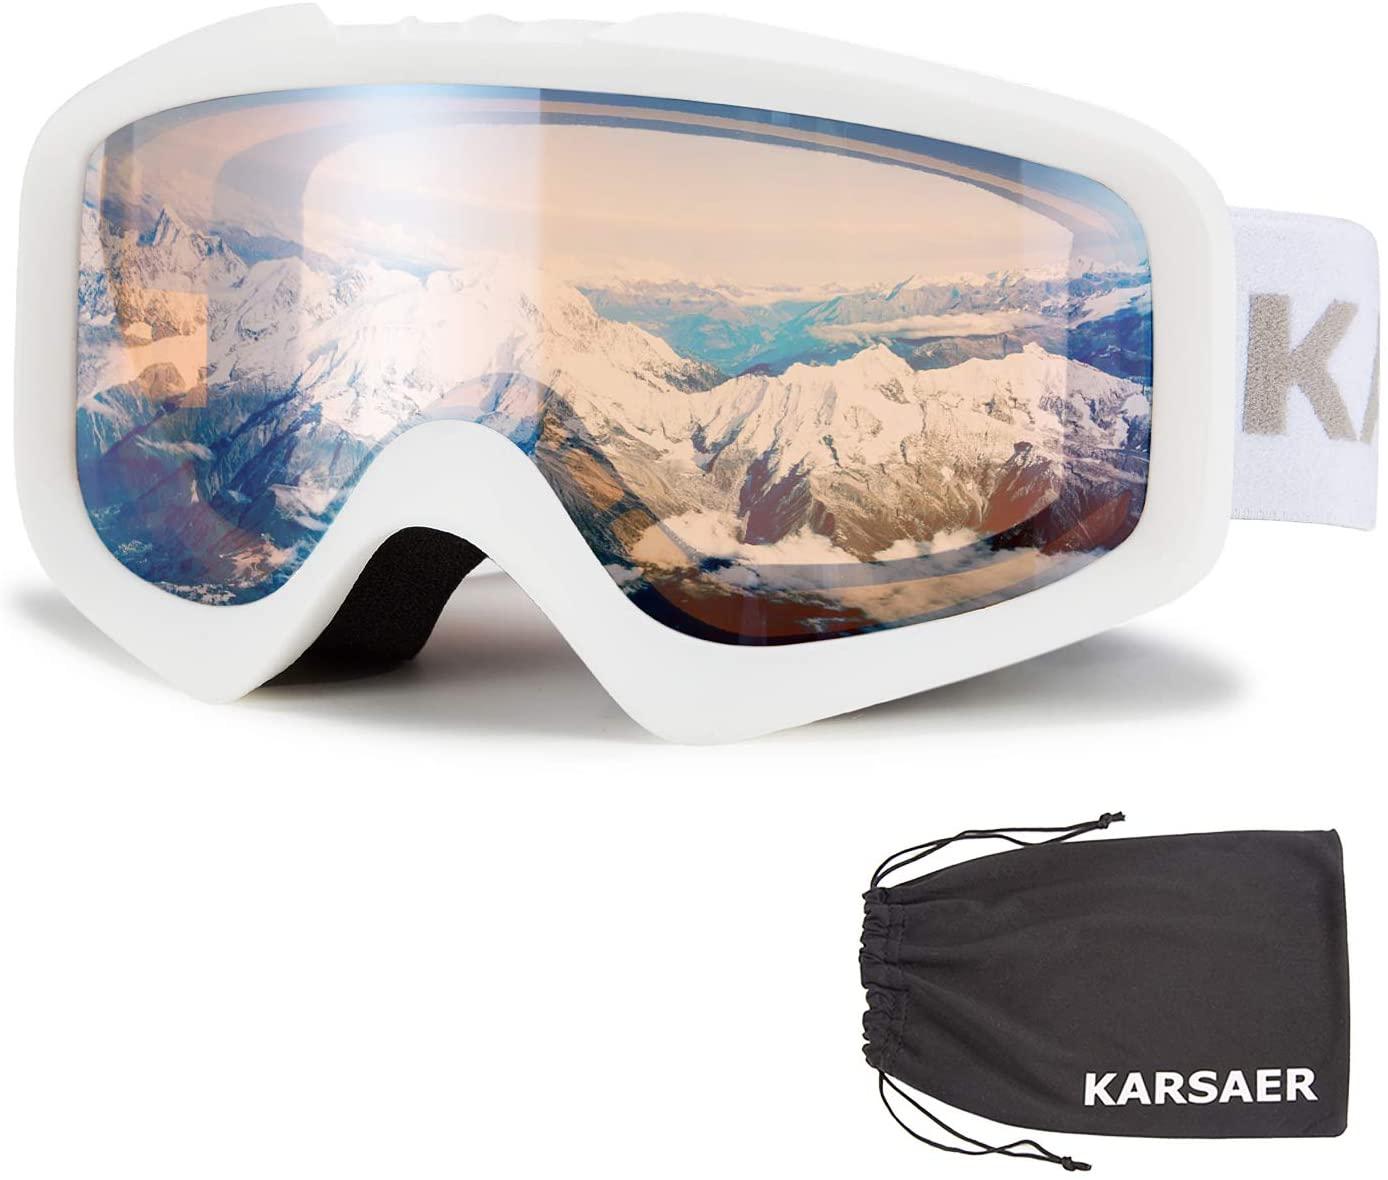 Karsaer Ski Goggles Anti-Fog Snowboard Goggles OTG 100% UV Protection Snow Goggles Bendable Dual-Lenses for Men Women Youth